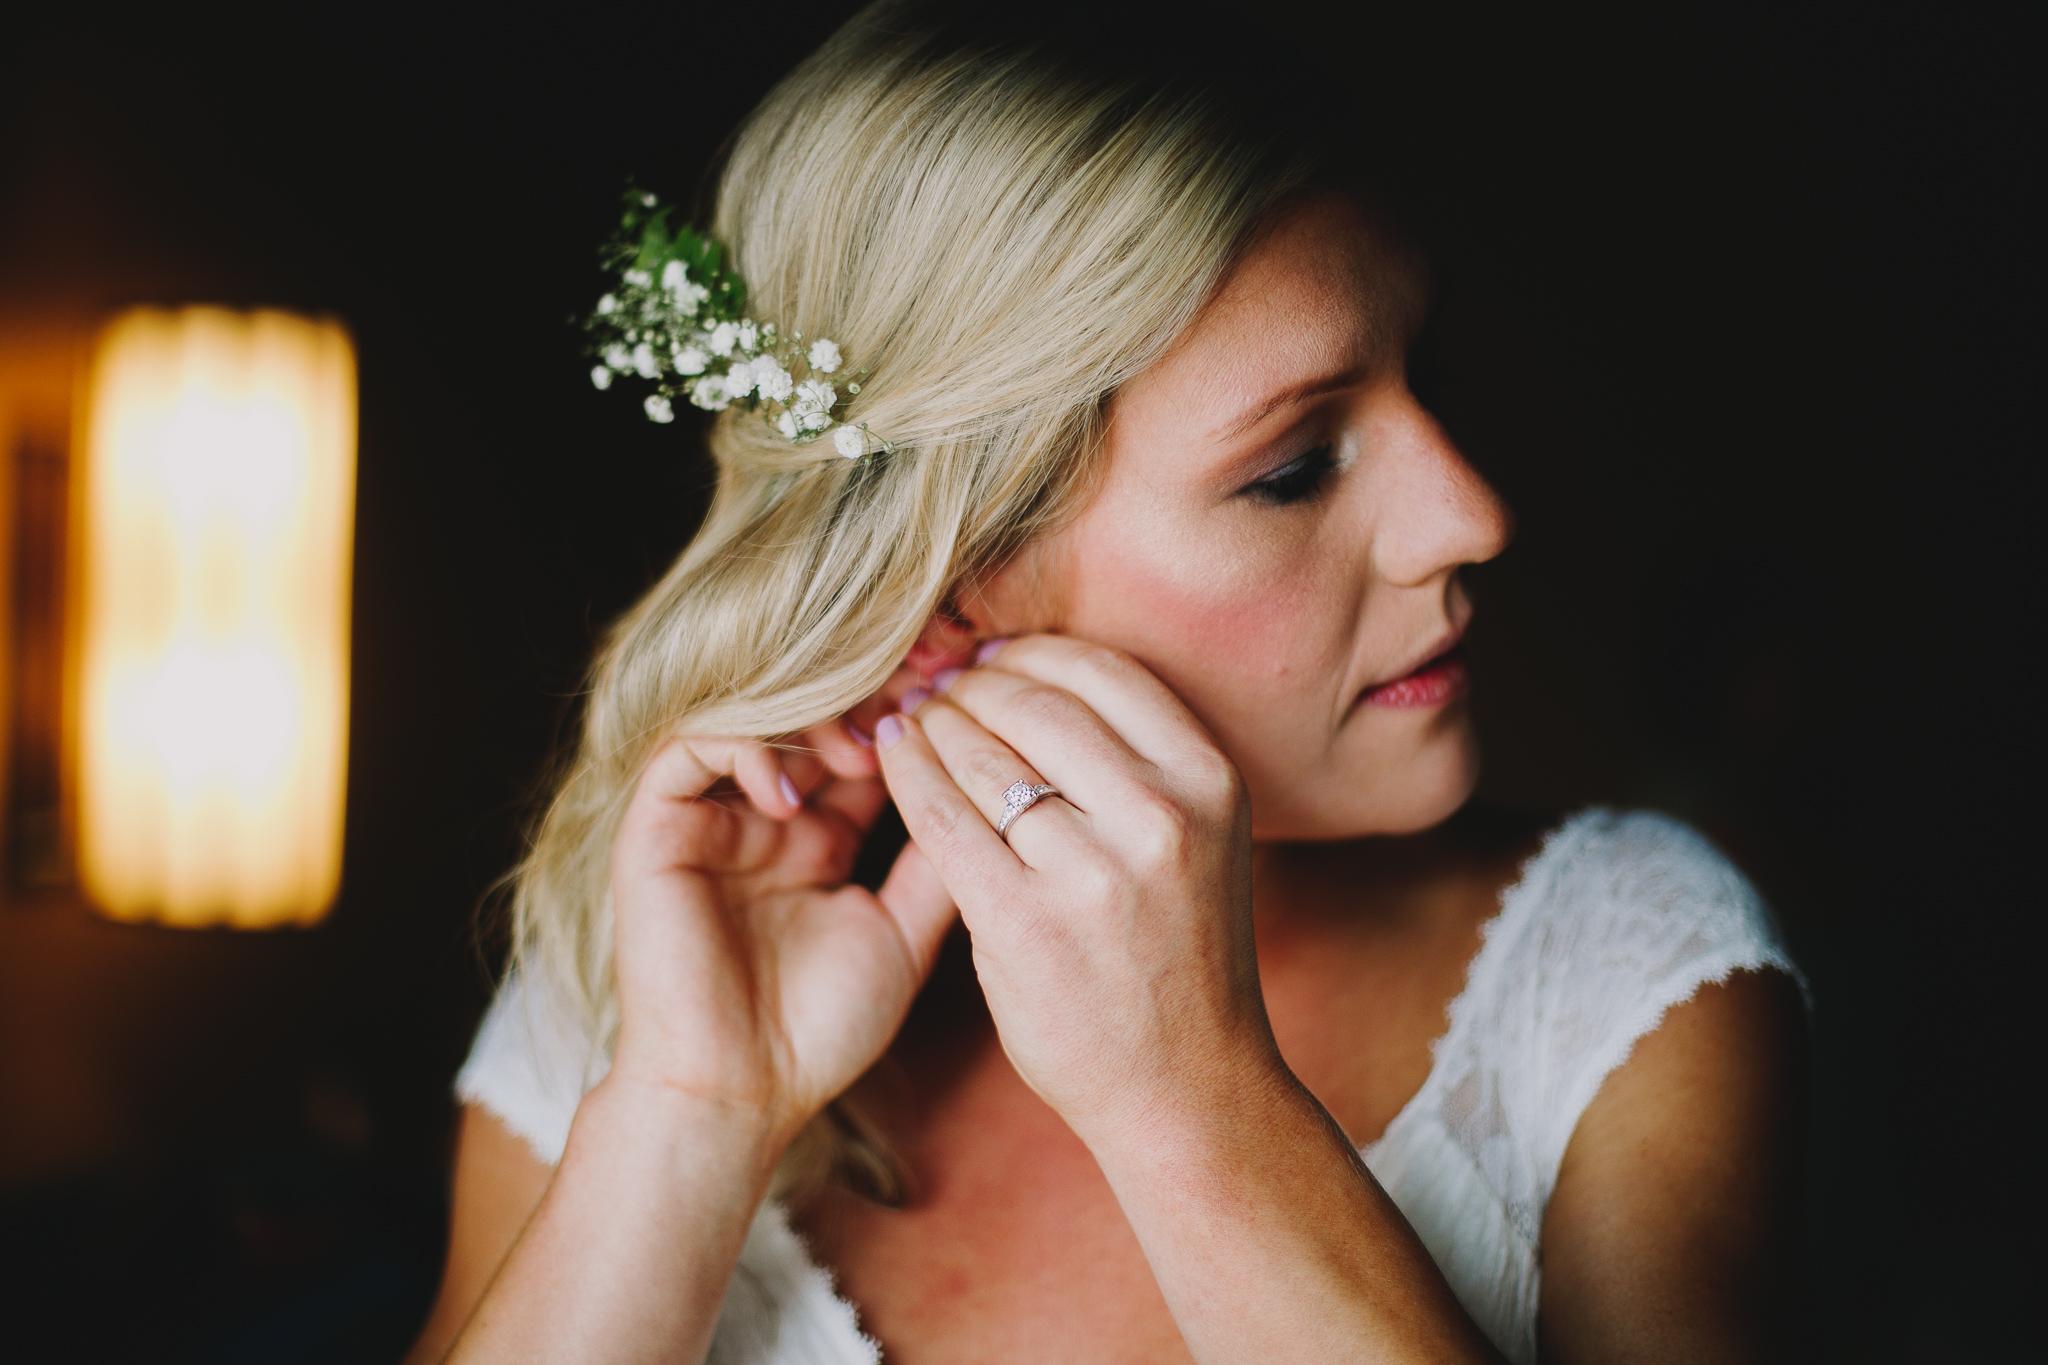 Archer_Inspired_Photography_Pacific_Grove_Ansilomar_Beach_Carmel_Valley_Wedding-27.jpg